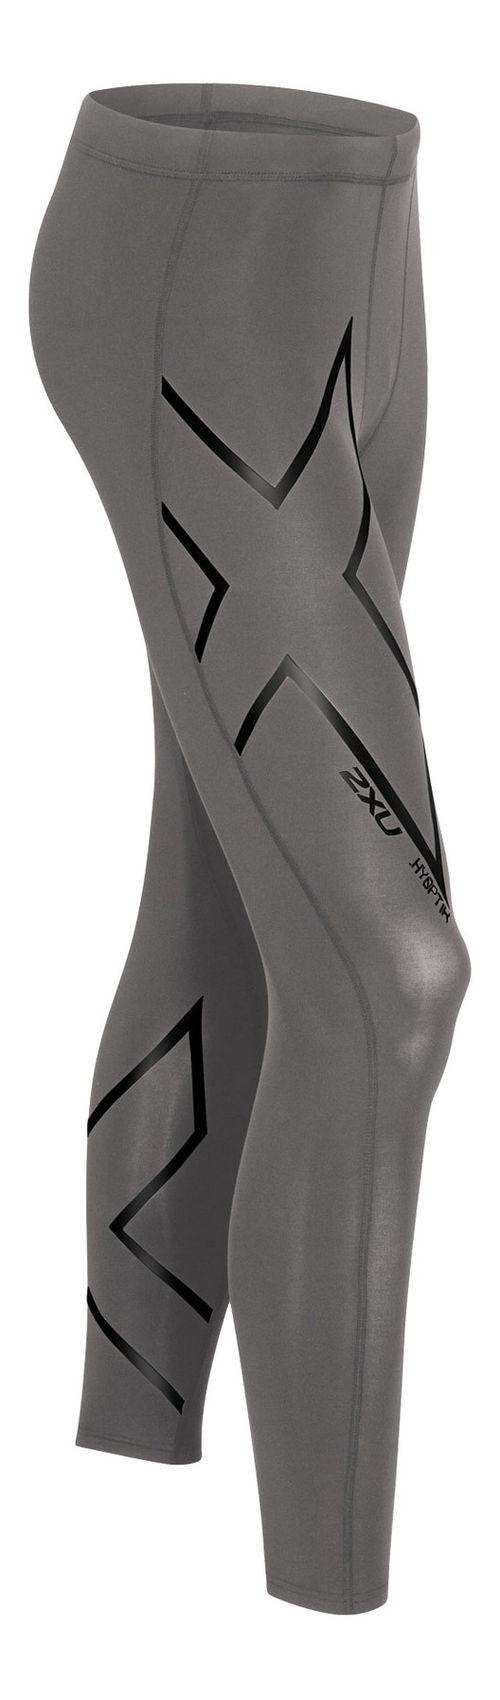 Mens 2XU Hyoptik Compression Tights & Leggings Pants - Steel/Black L